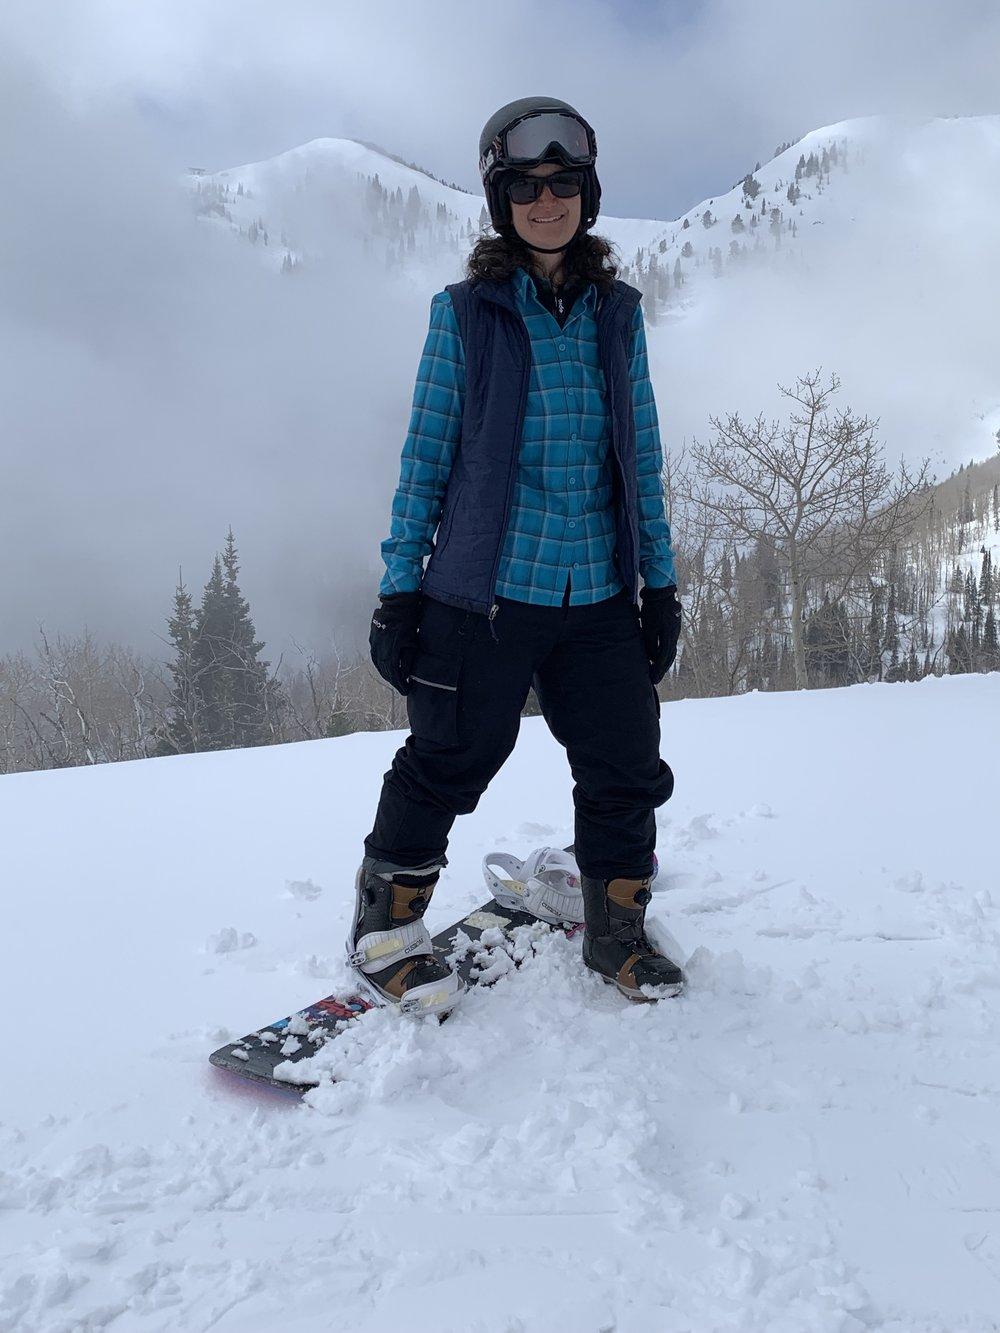 Laura on Snowboard.jpeg